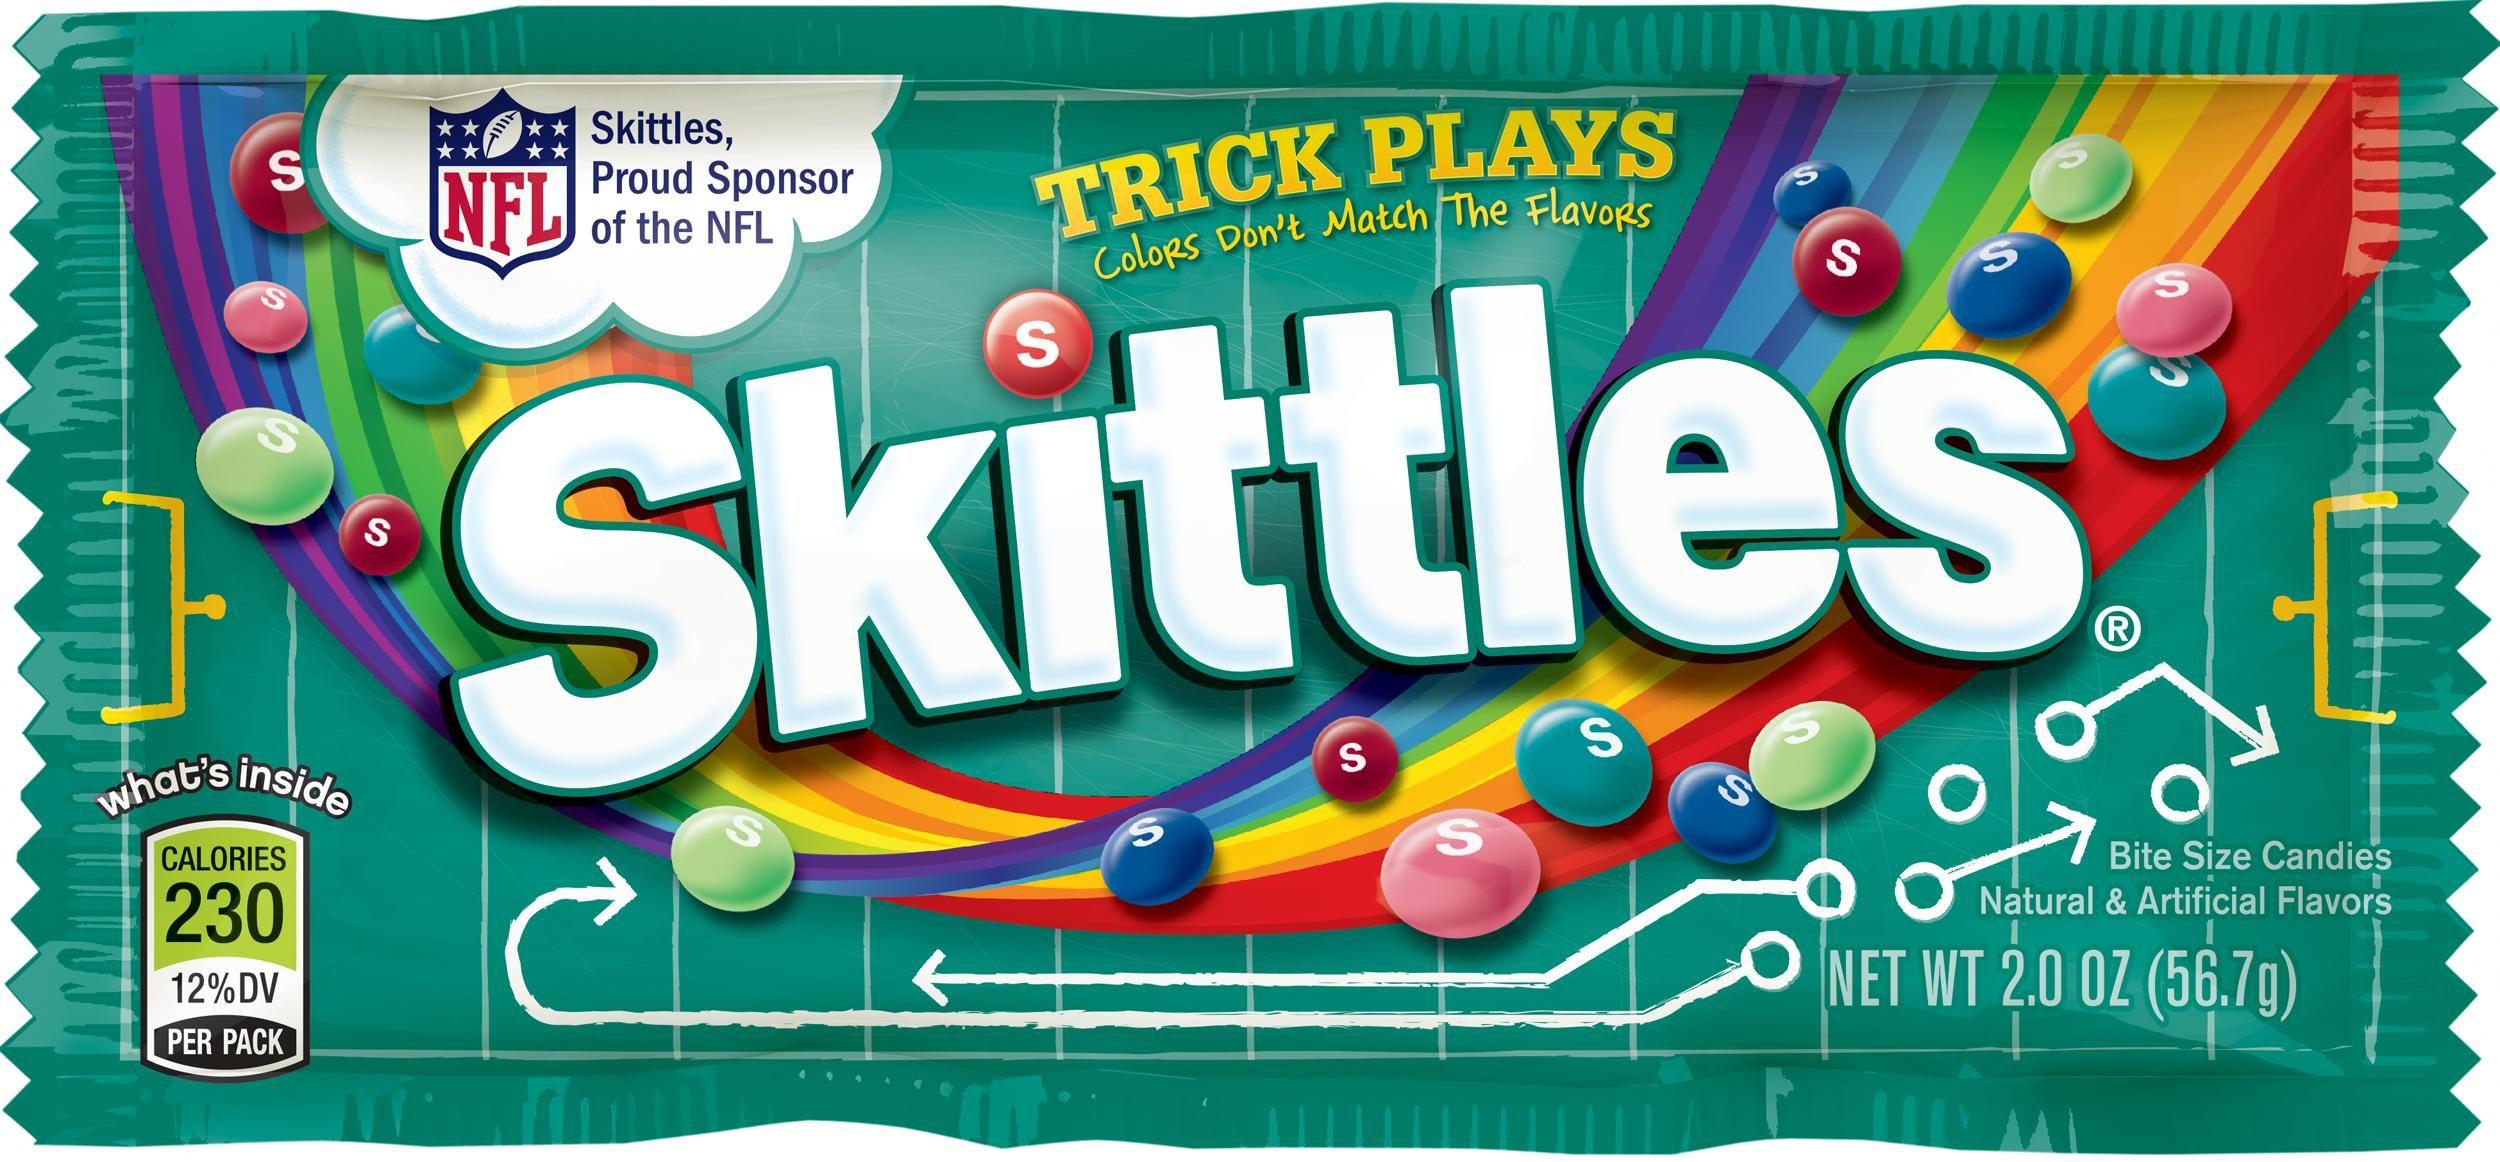 Skittles Launches New Flavors for Football Season - Skittles ...